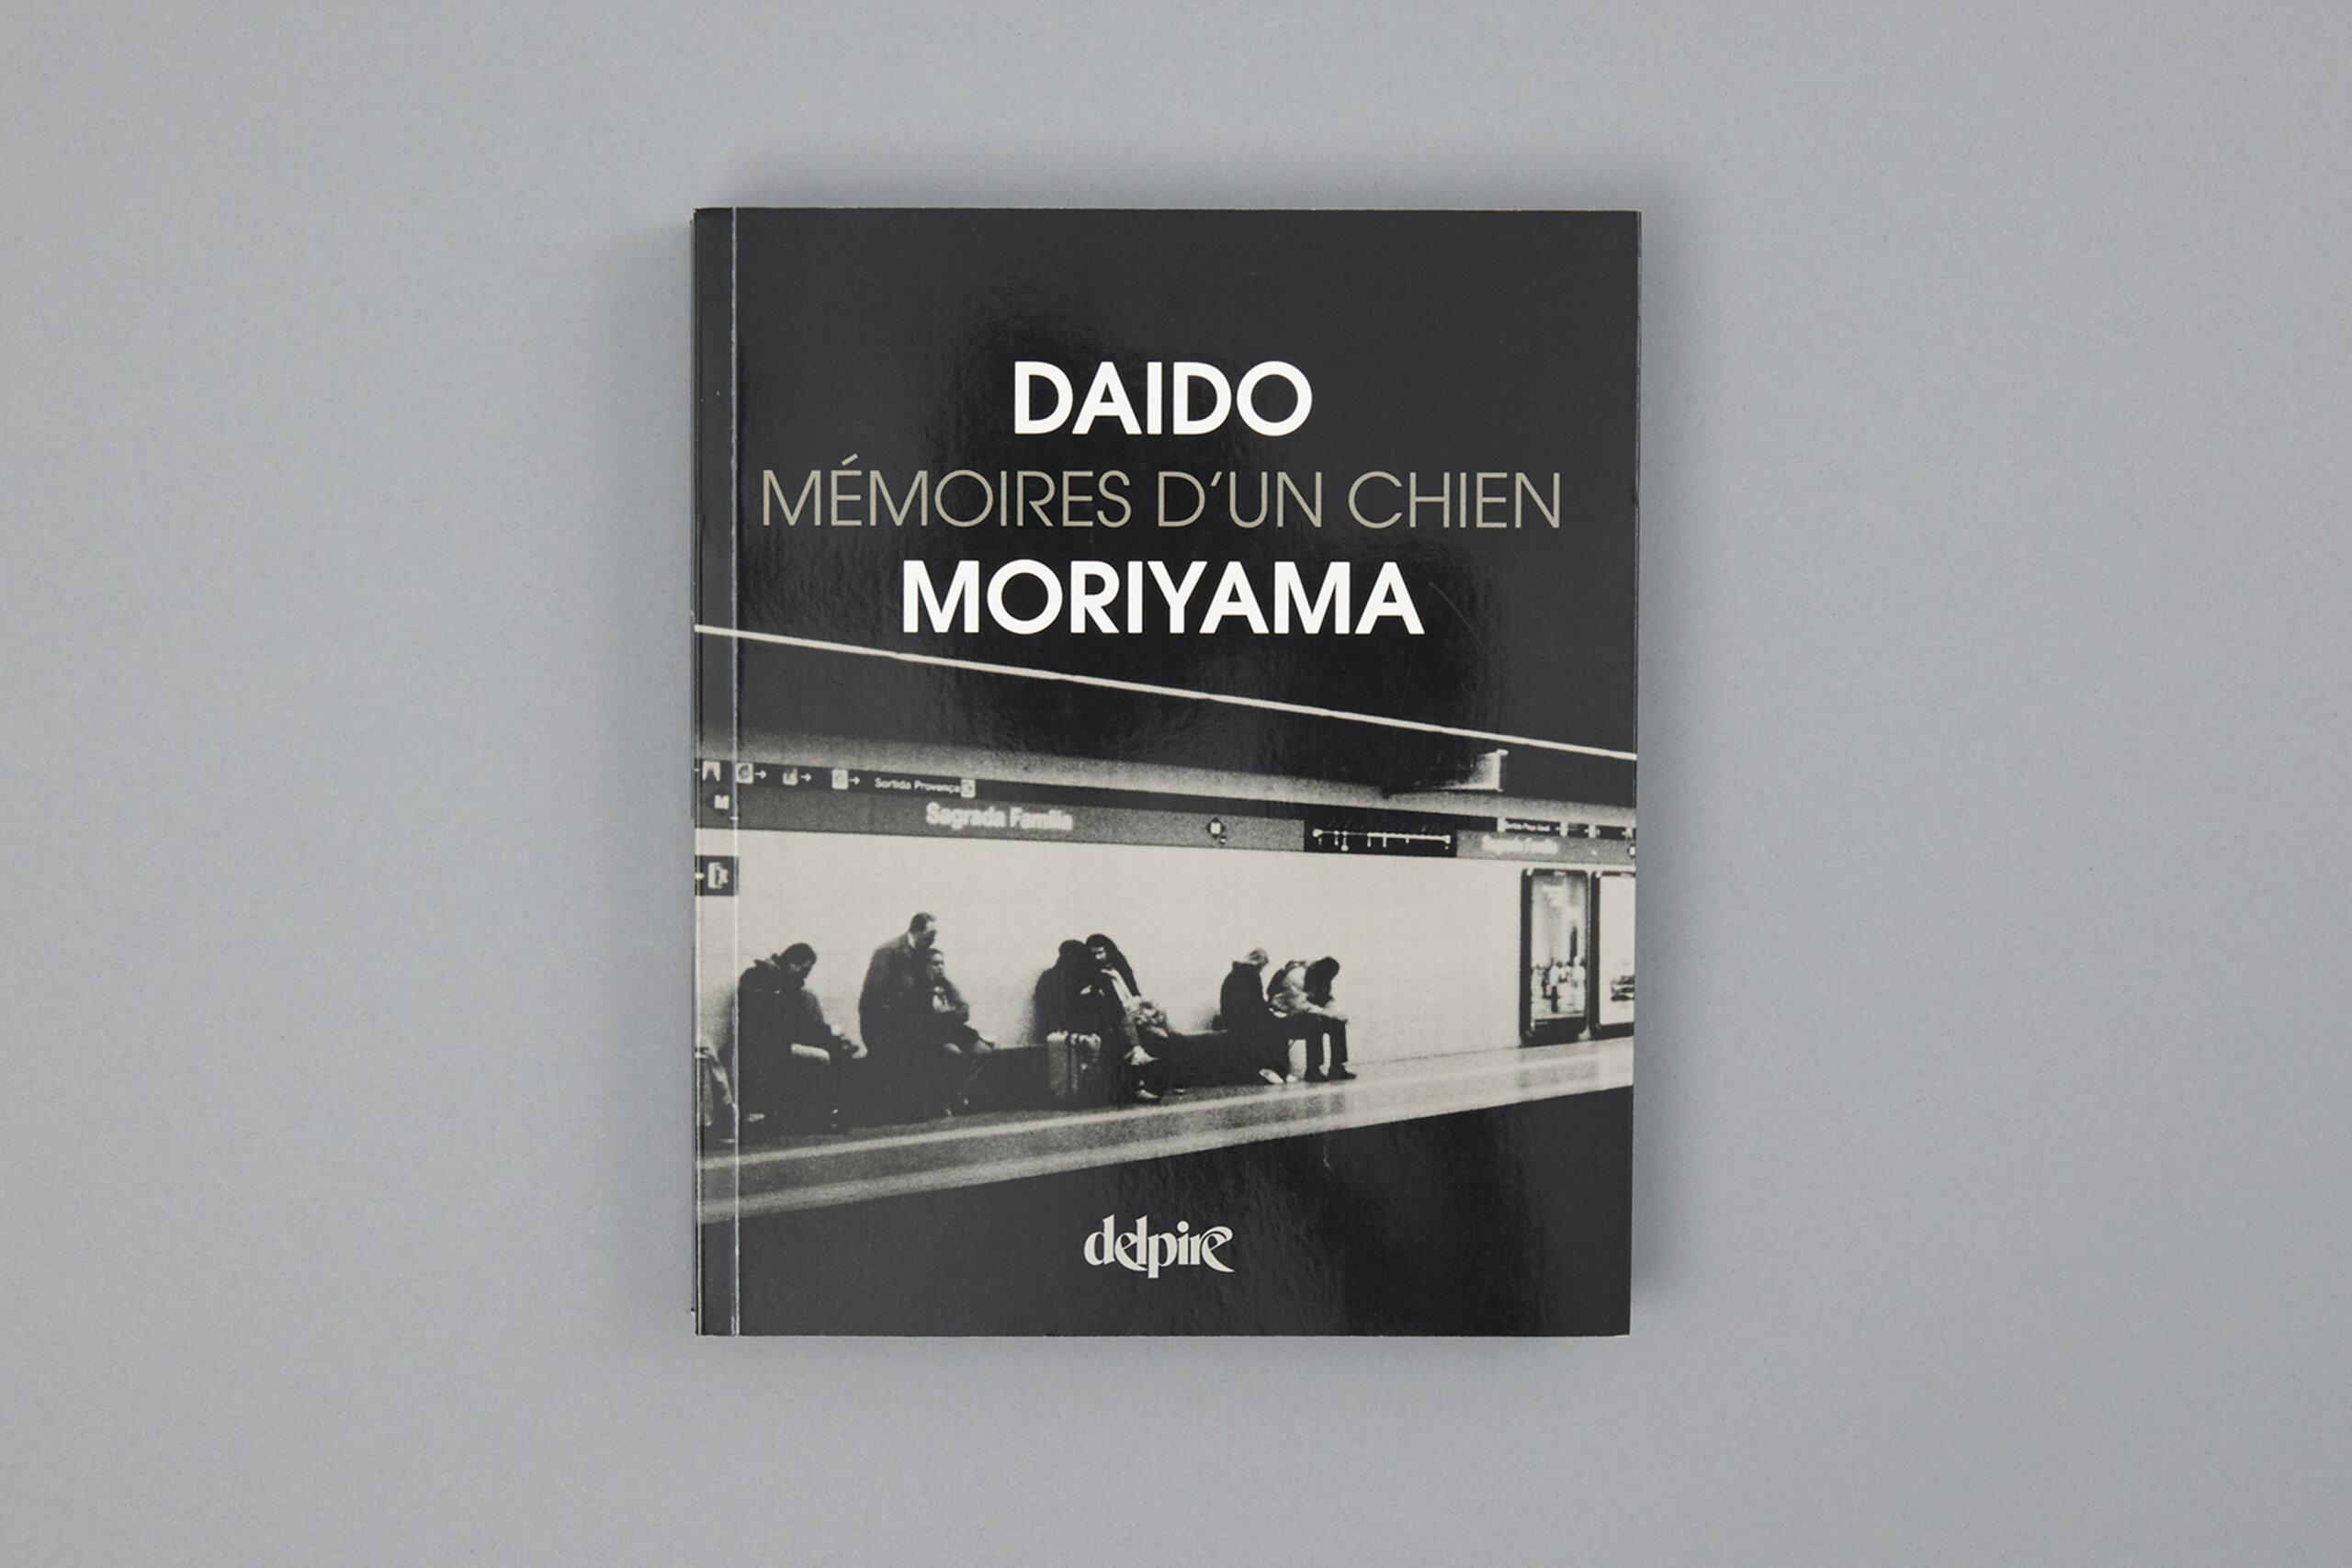 delpire-MORIYAMA-daido-mémoires-dun-chien